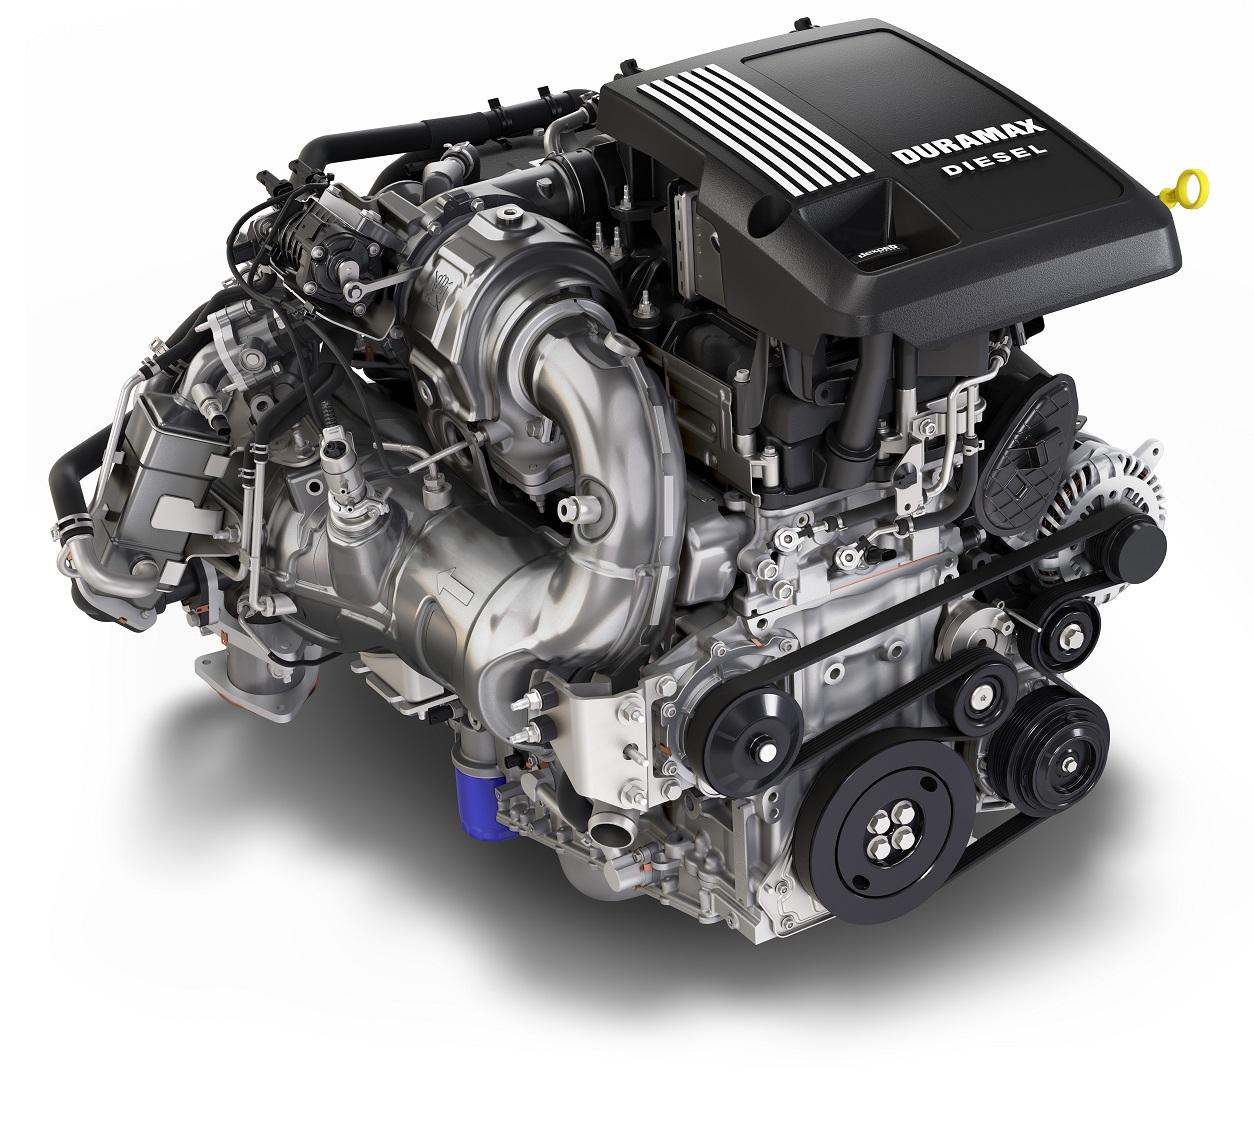 Chevy Silverado's Duramax Diesel Late, Pricey | WardsAuto